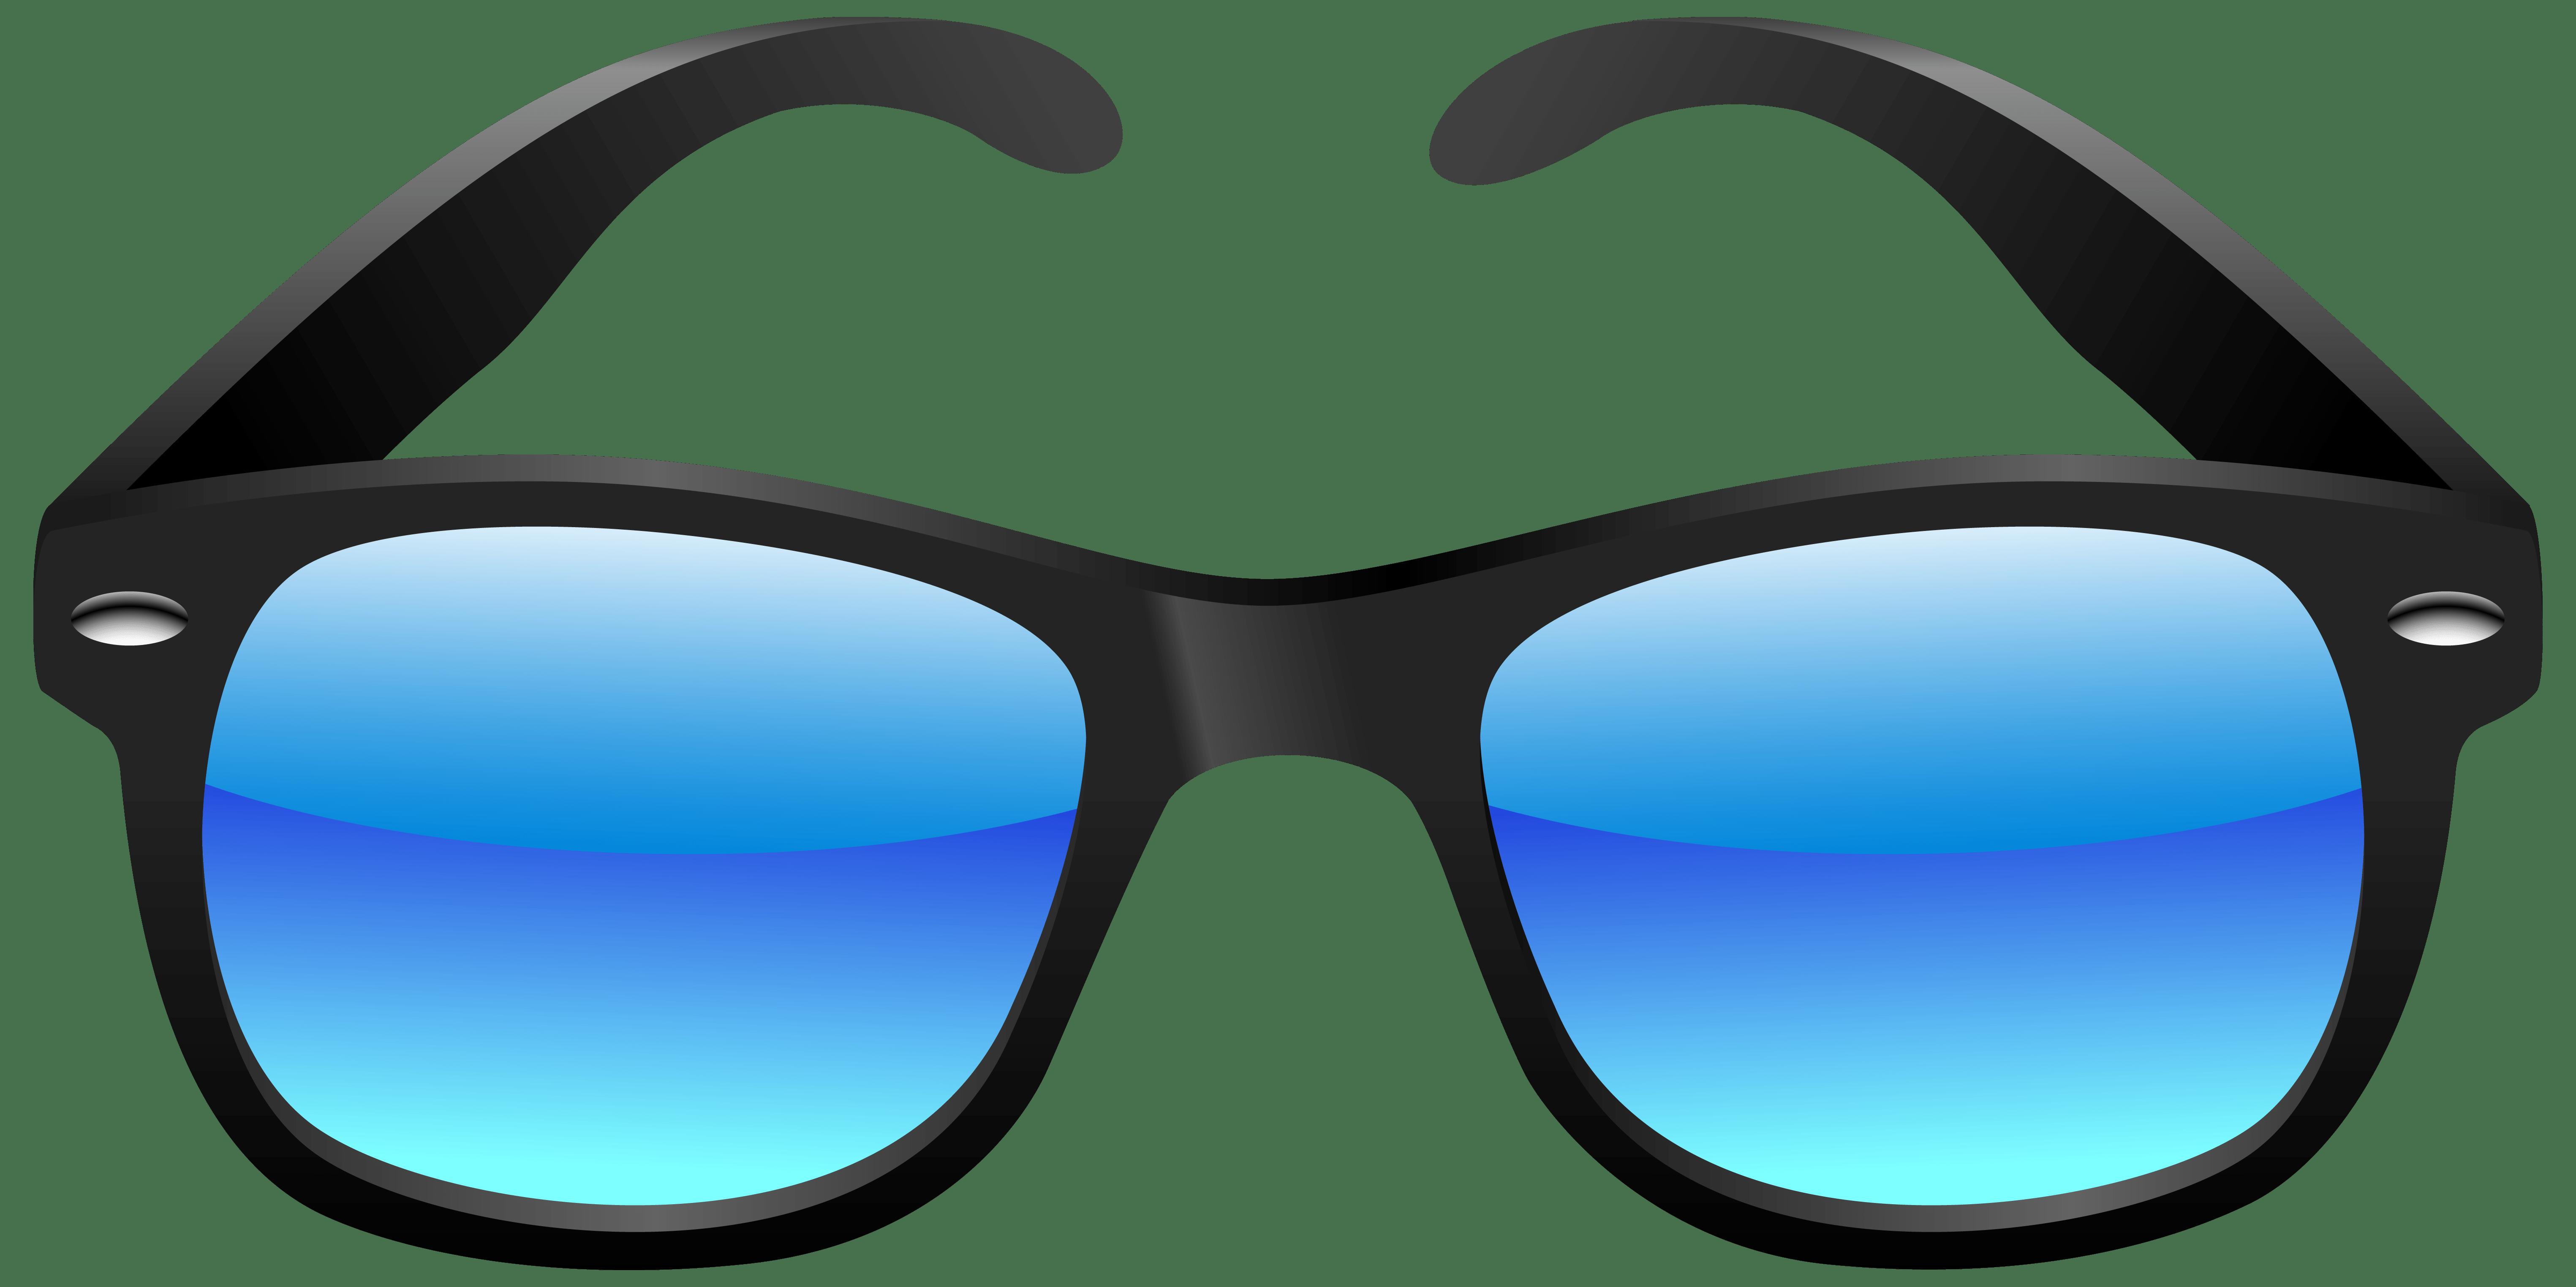 Clipart shades clip art free Clipart shades 4 » Clipart Portal clip art free